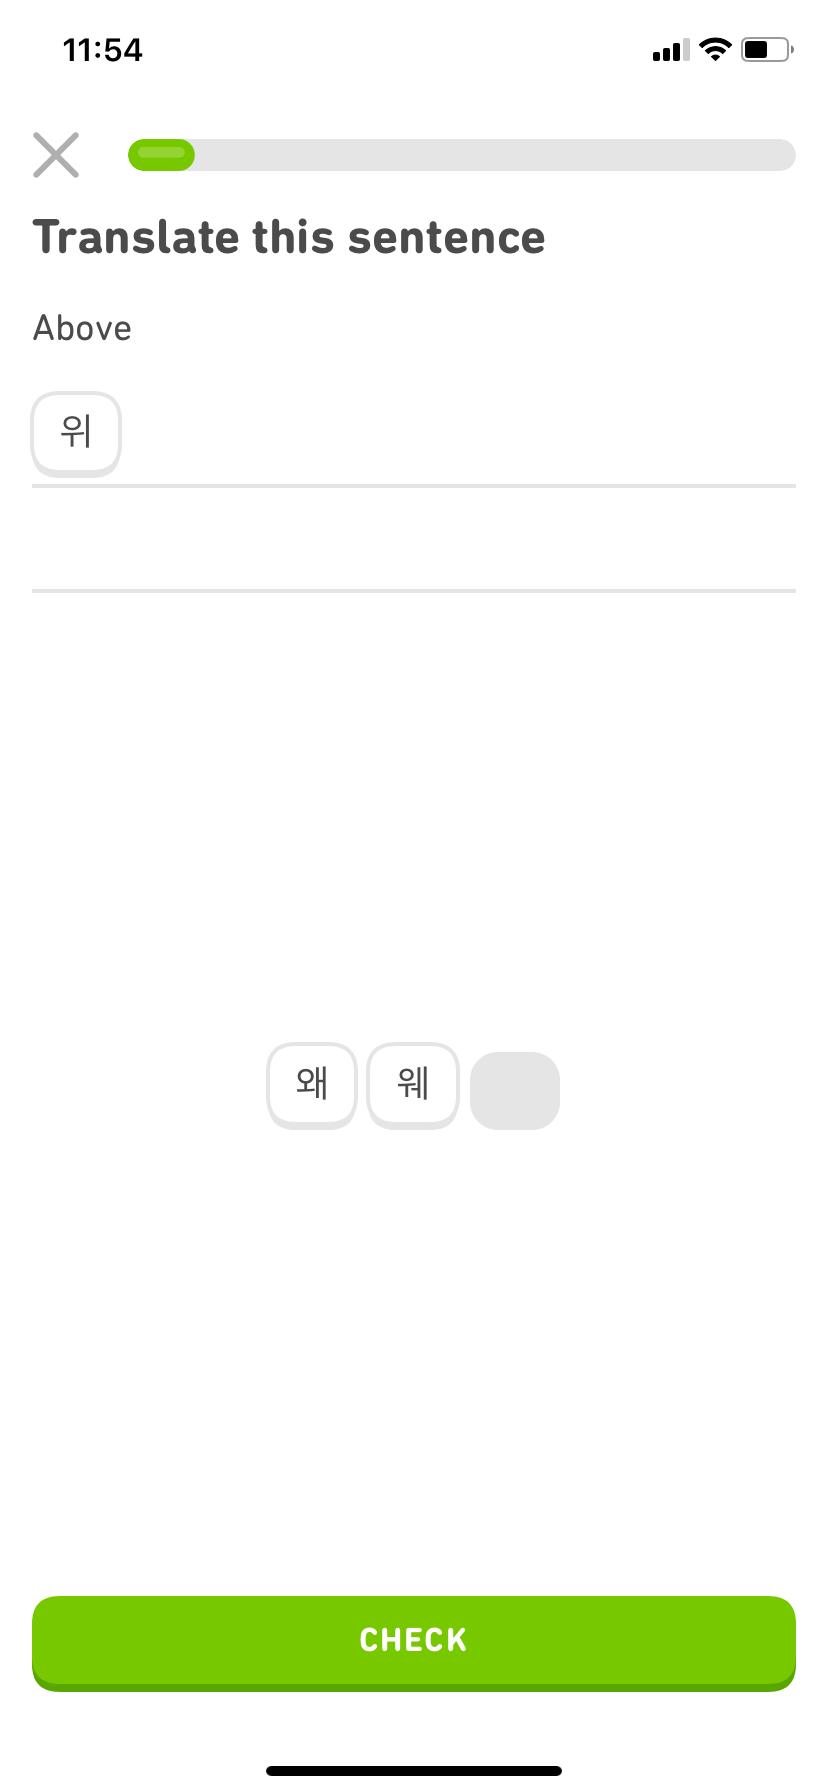 duolingo user onboarding language lesson mobile app ux example